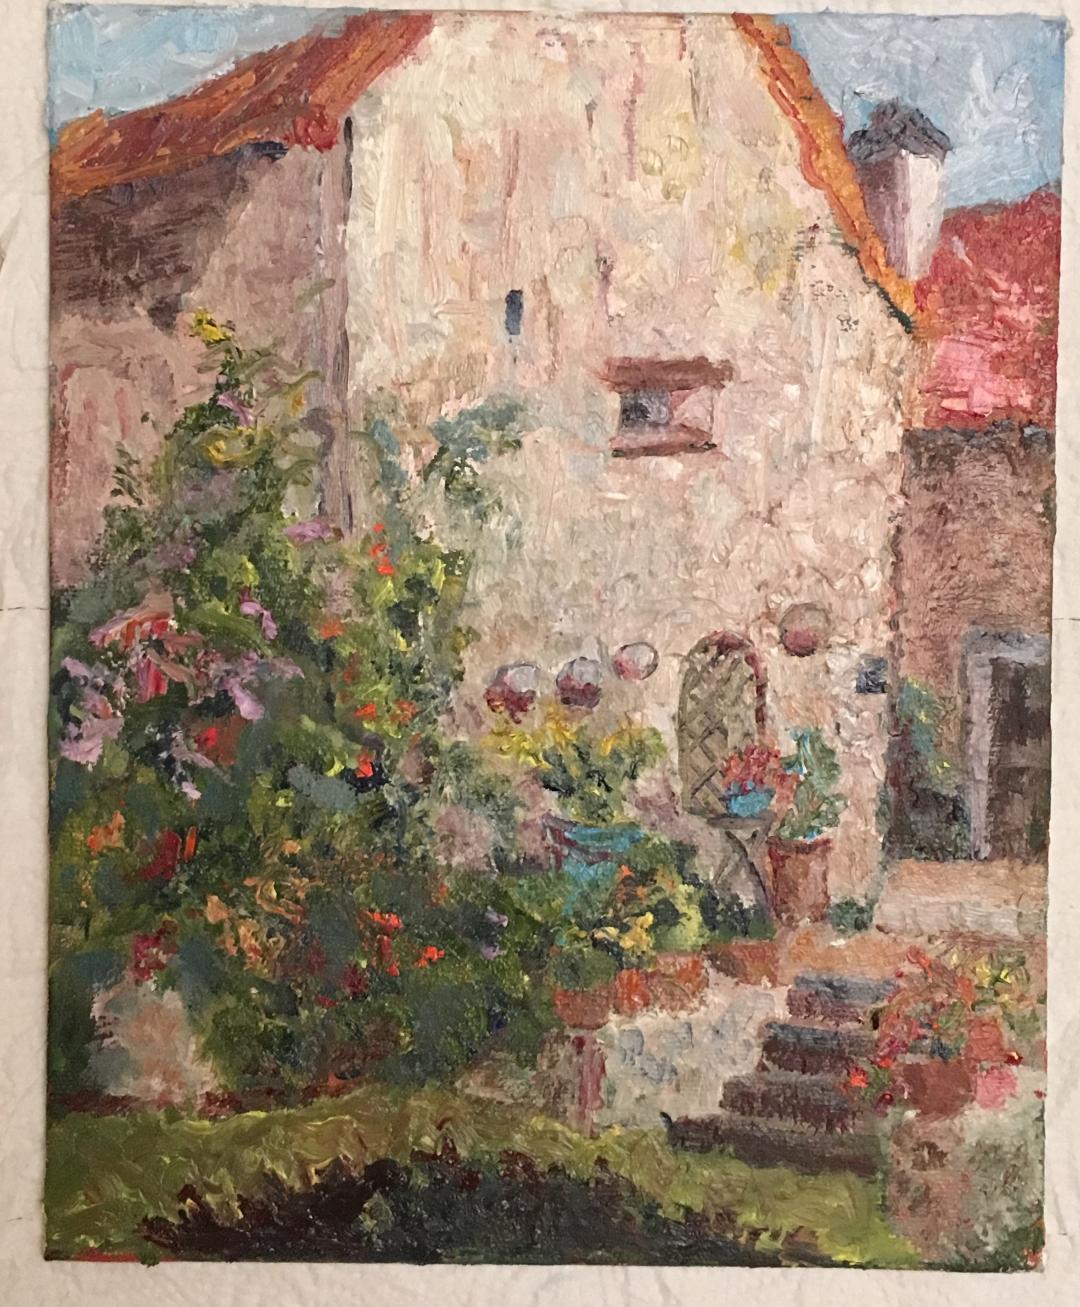 """The House in Back"" Plein air, Auvers-sur-Oise, France Oils 8 x 10"